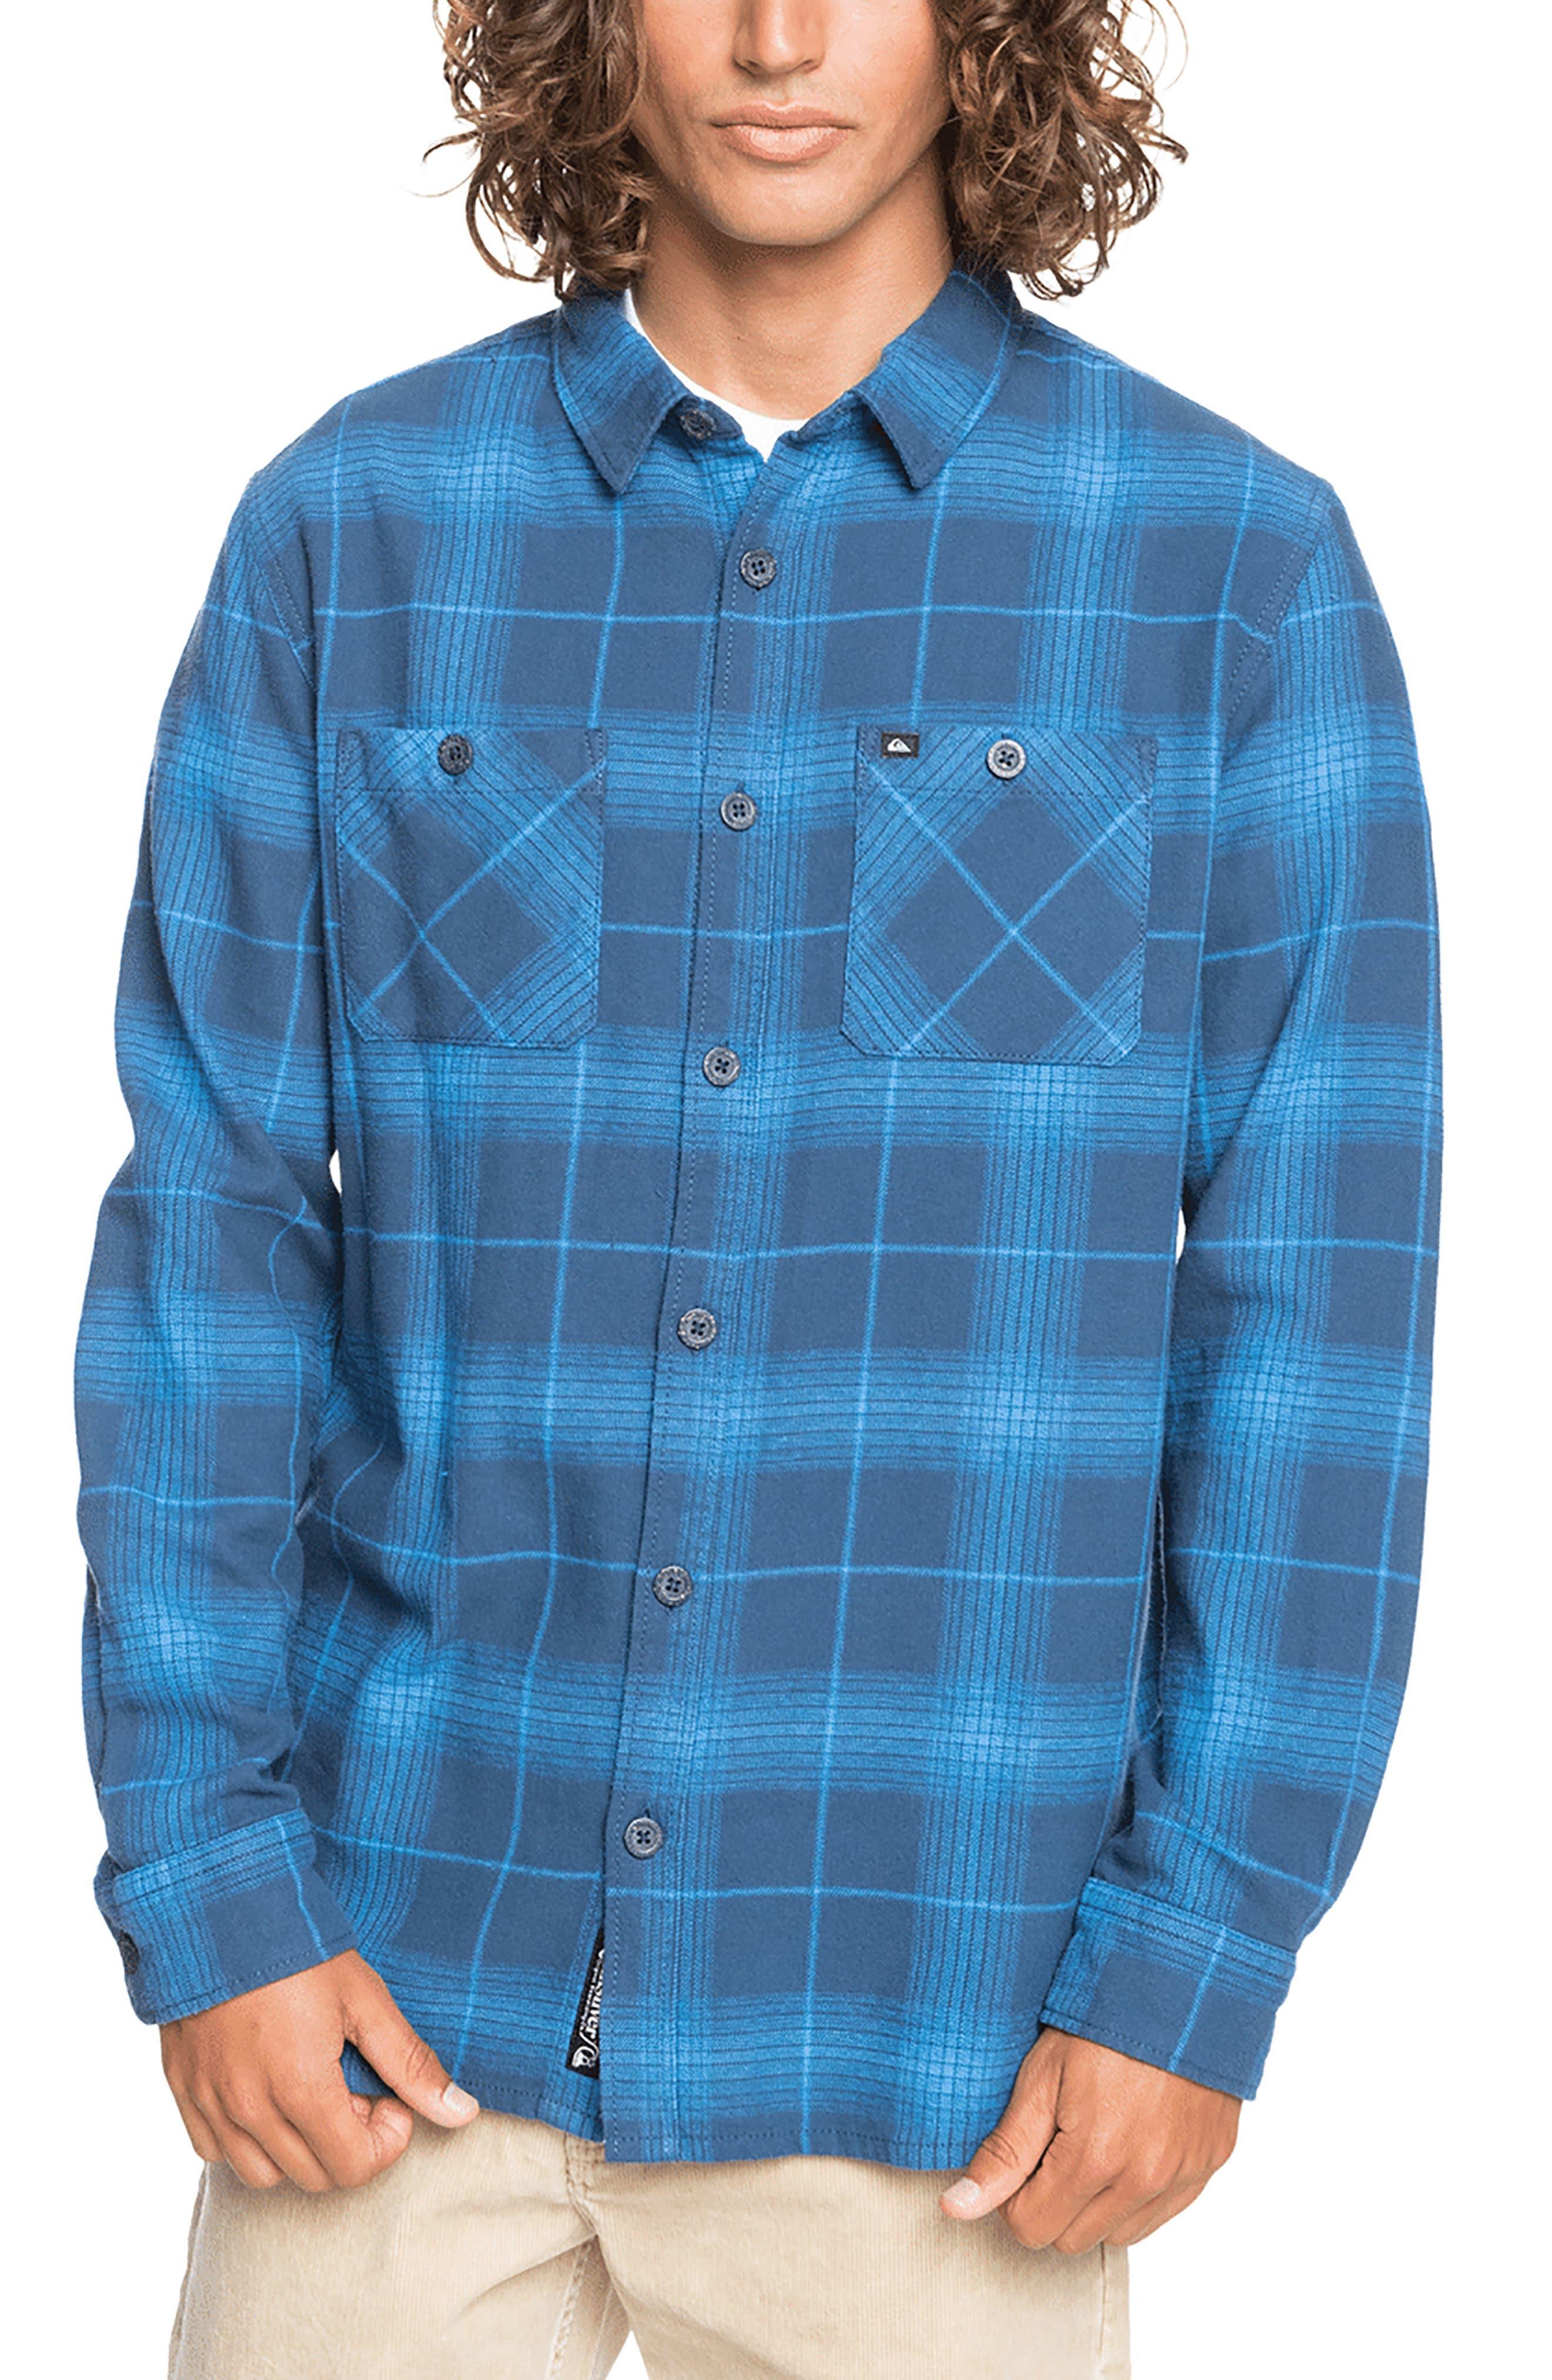 Orange Small Quiksilver Mens Flannel Button Up Shirt